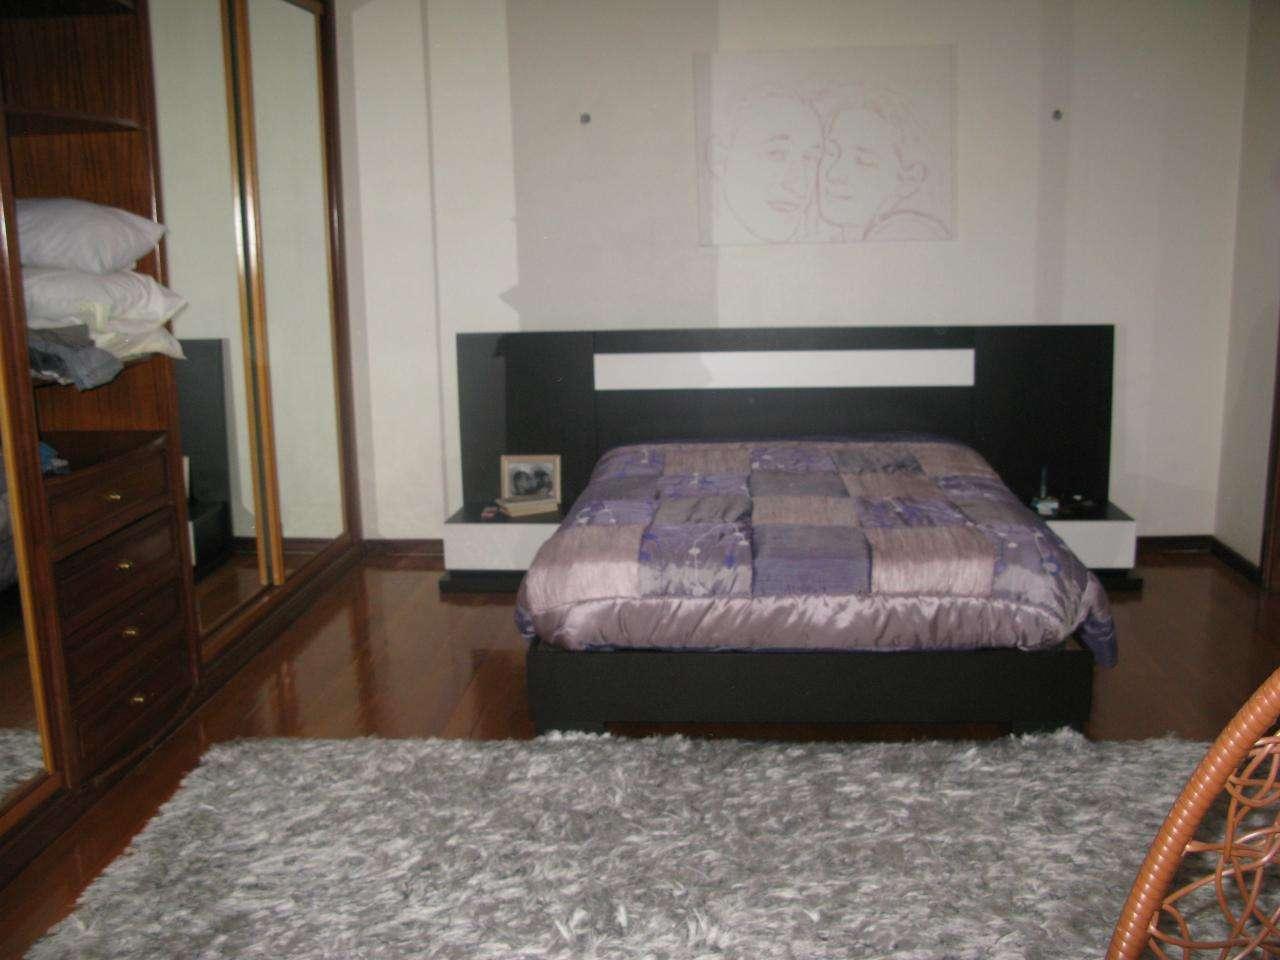 Apartamento para comprar, Vila de Cucujães, Aveiro - Foto 5